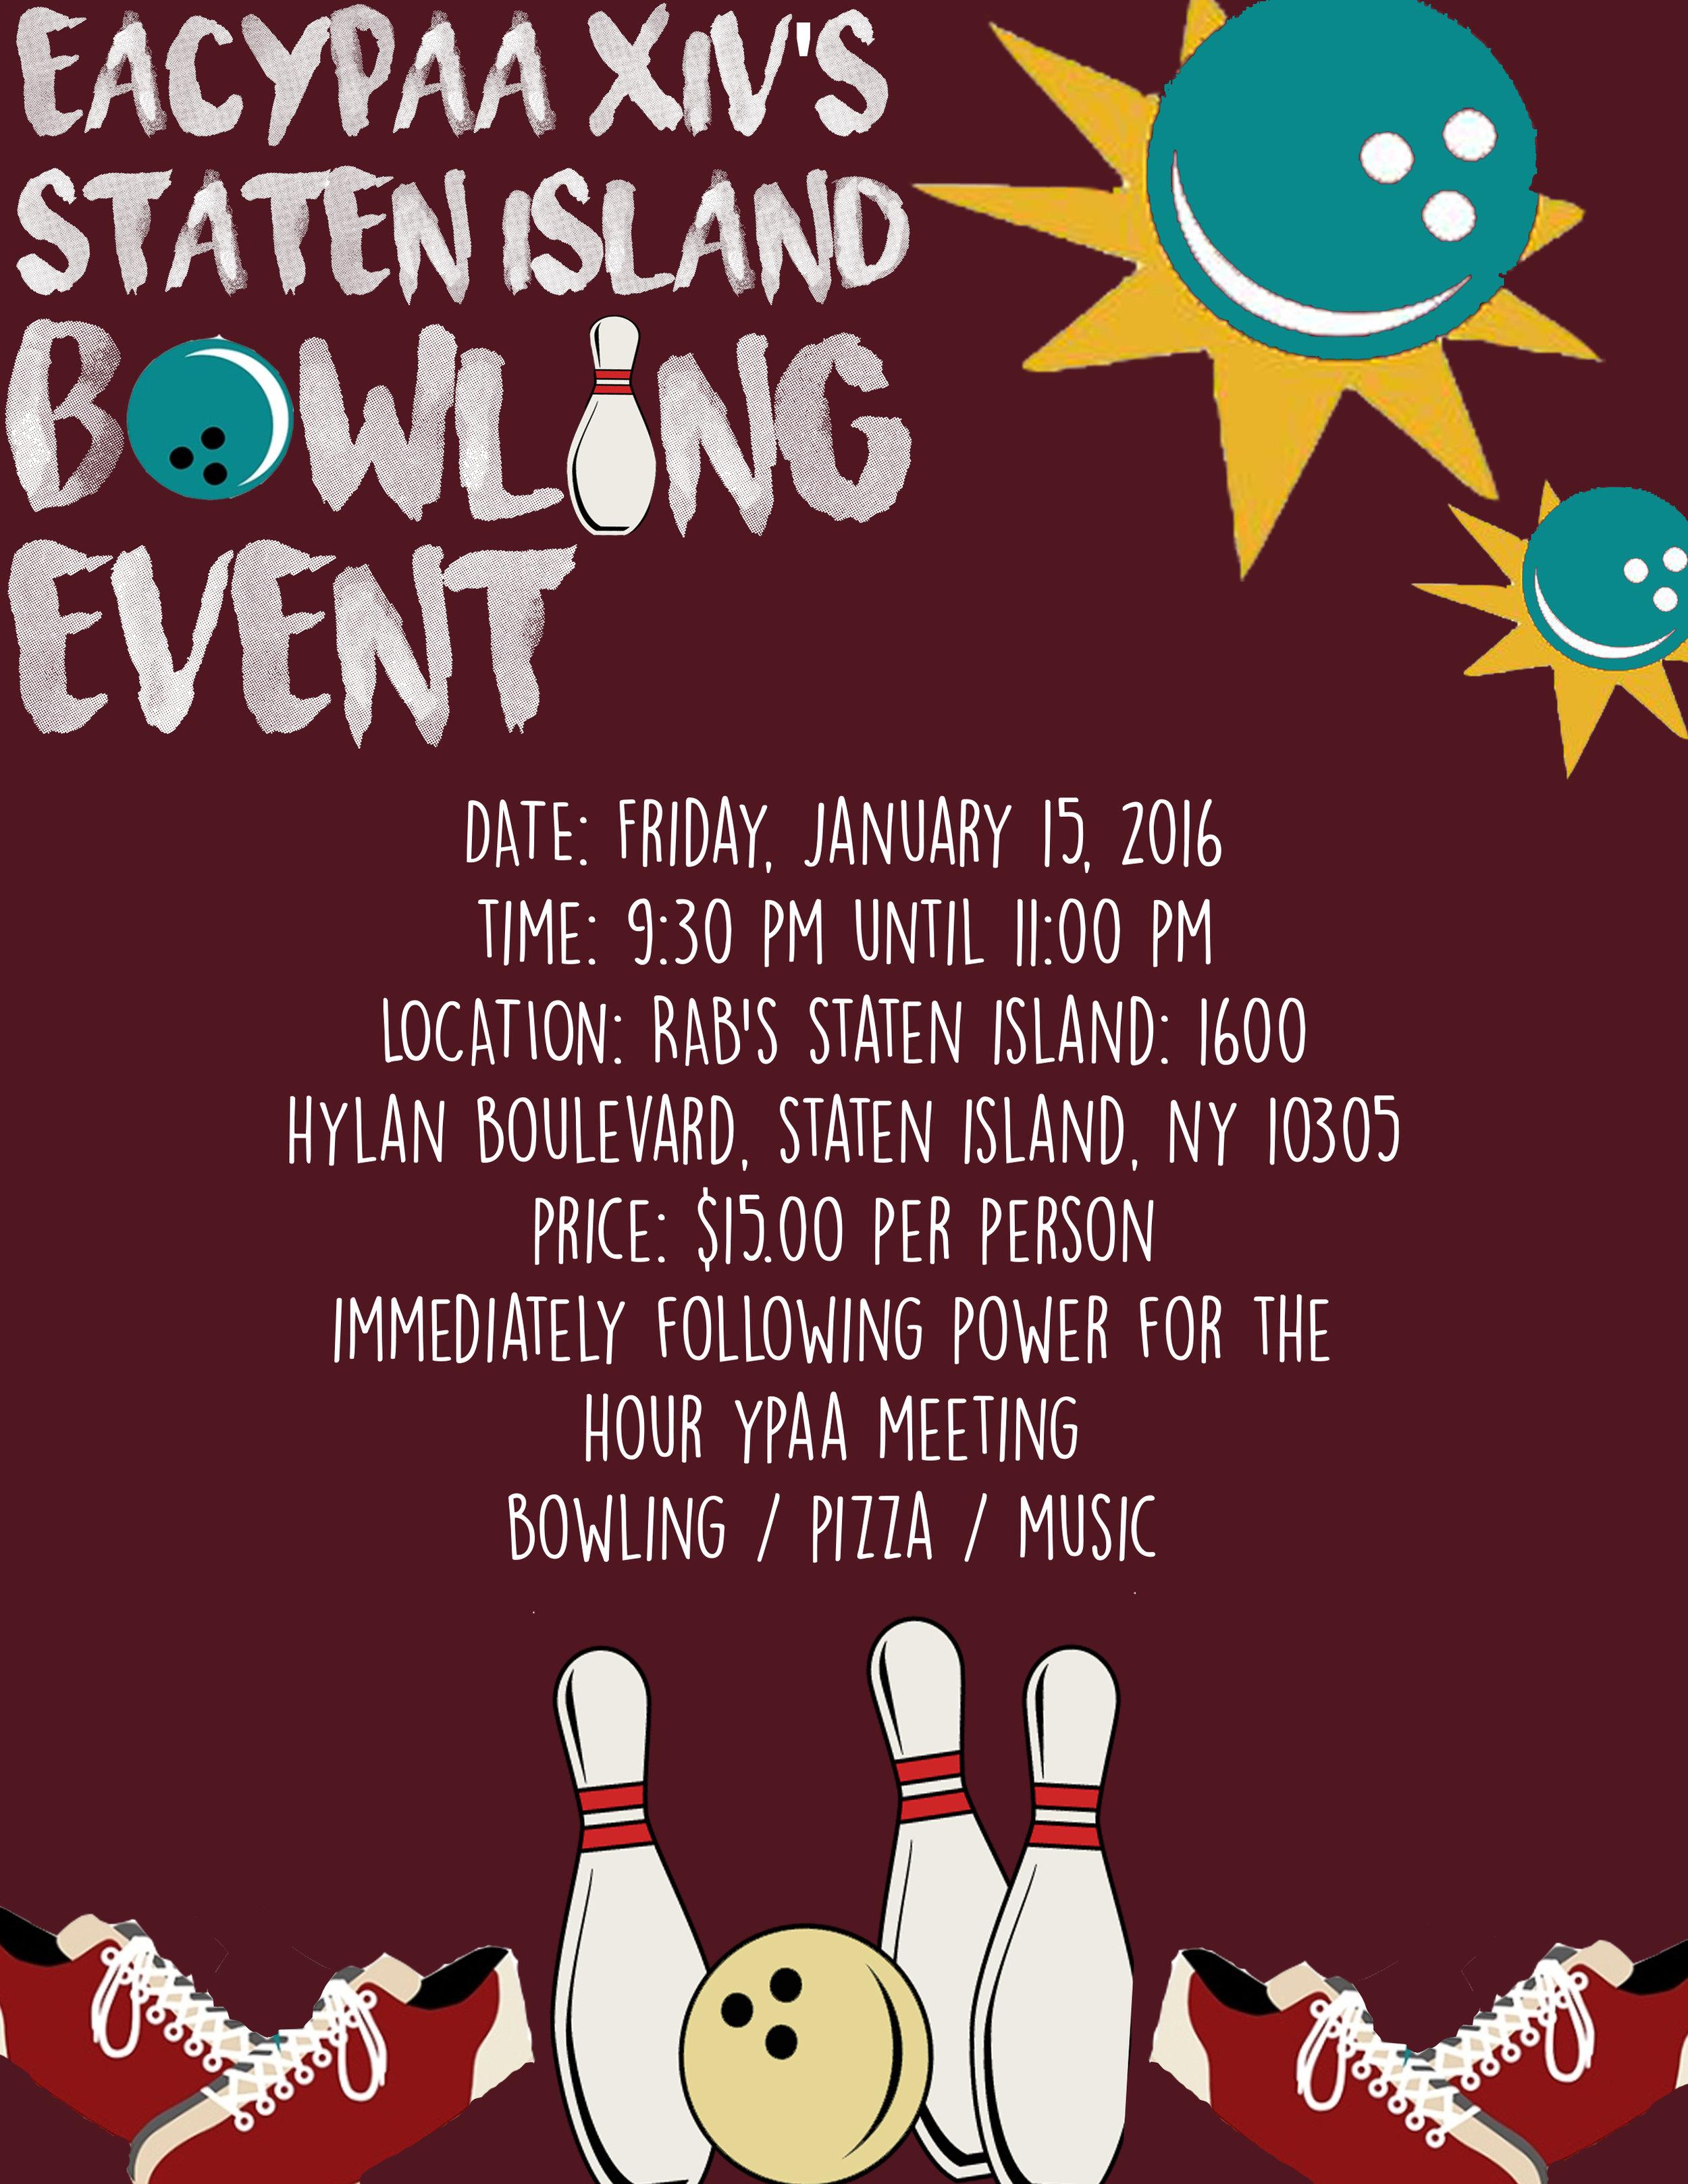 EACYPAA Bowling Event copy 2.jpg